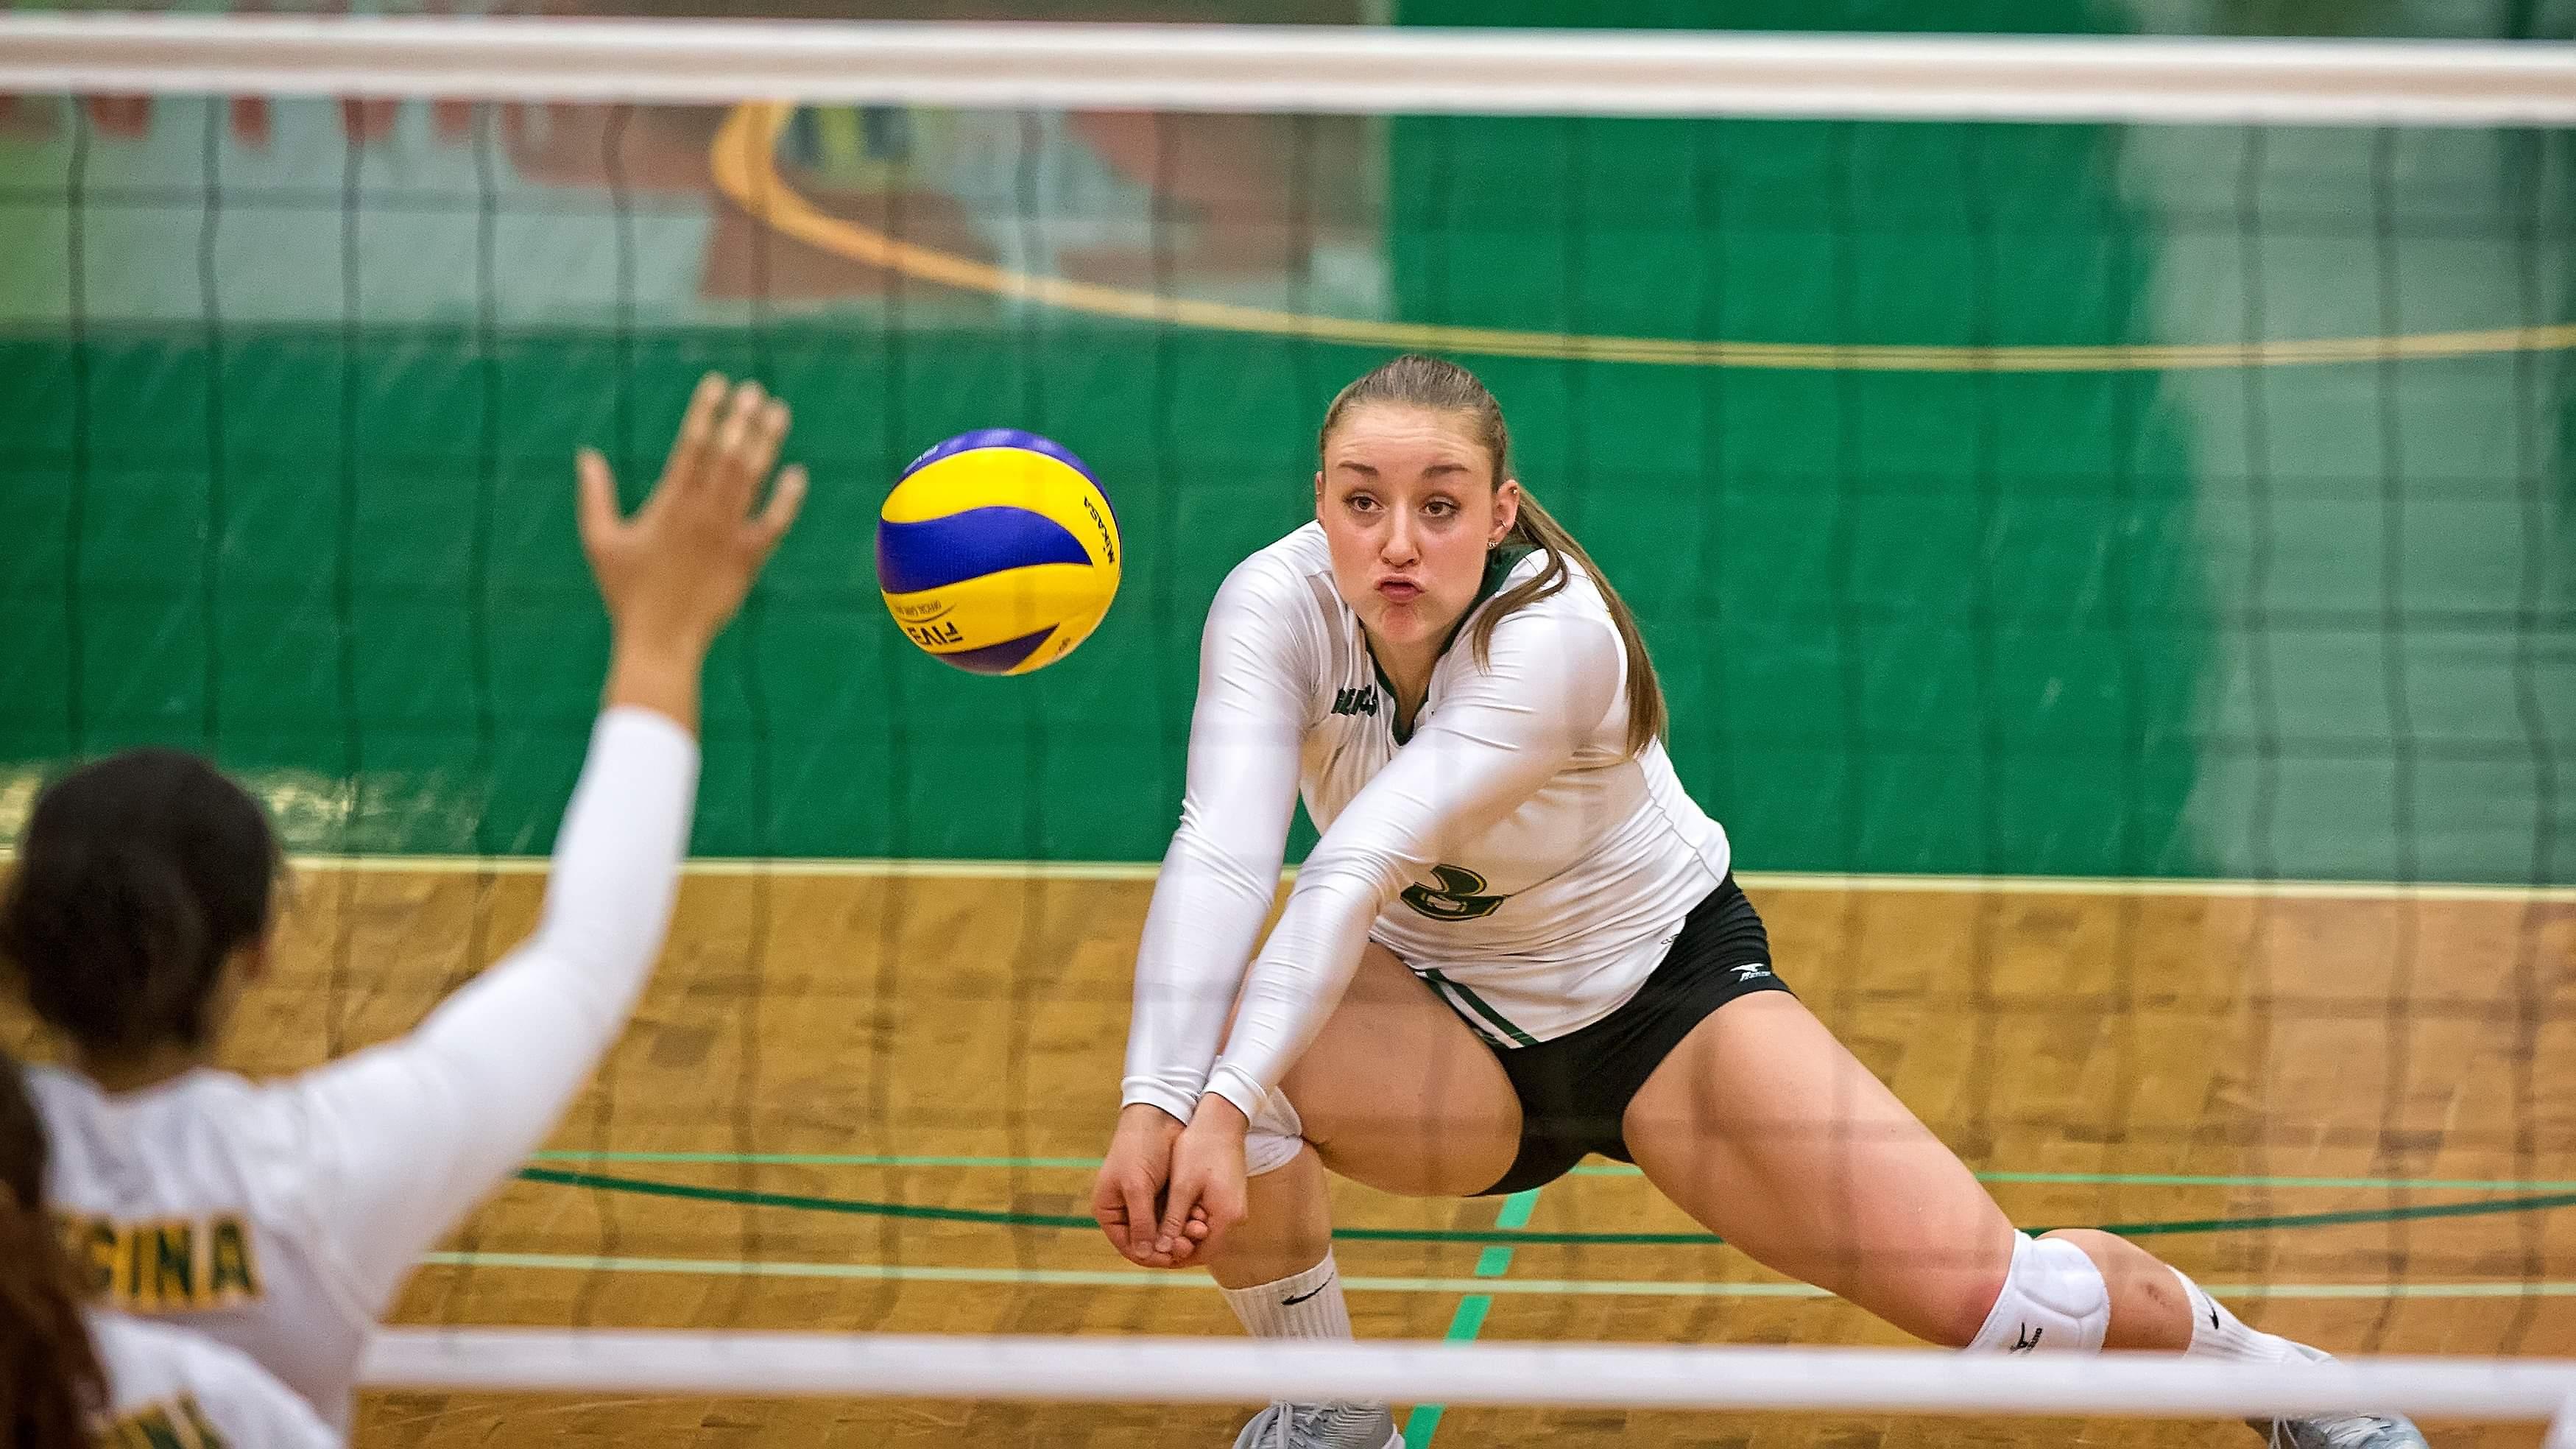 Erica Walsh - CSJ BA graduate and former Pandas Volleyball player